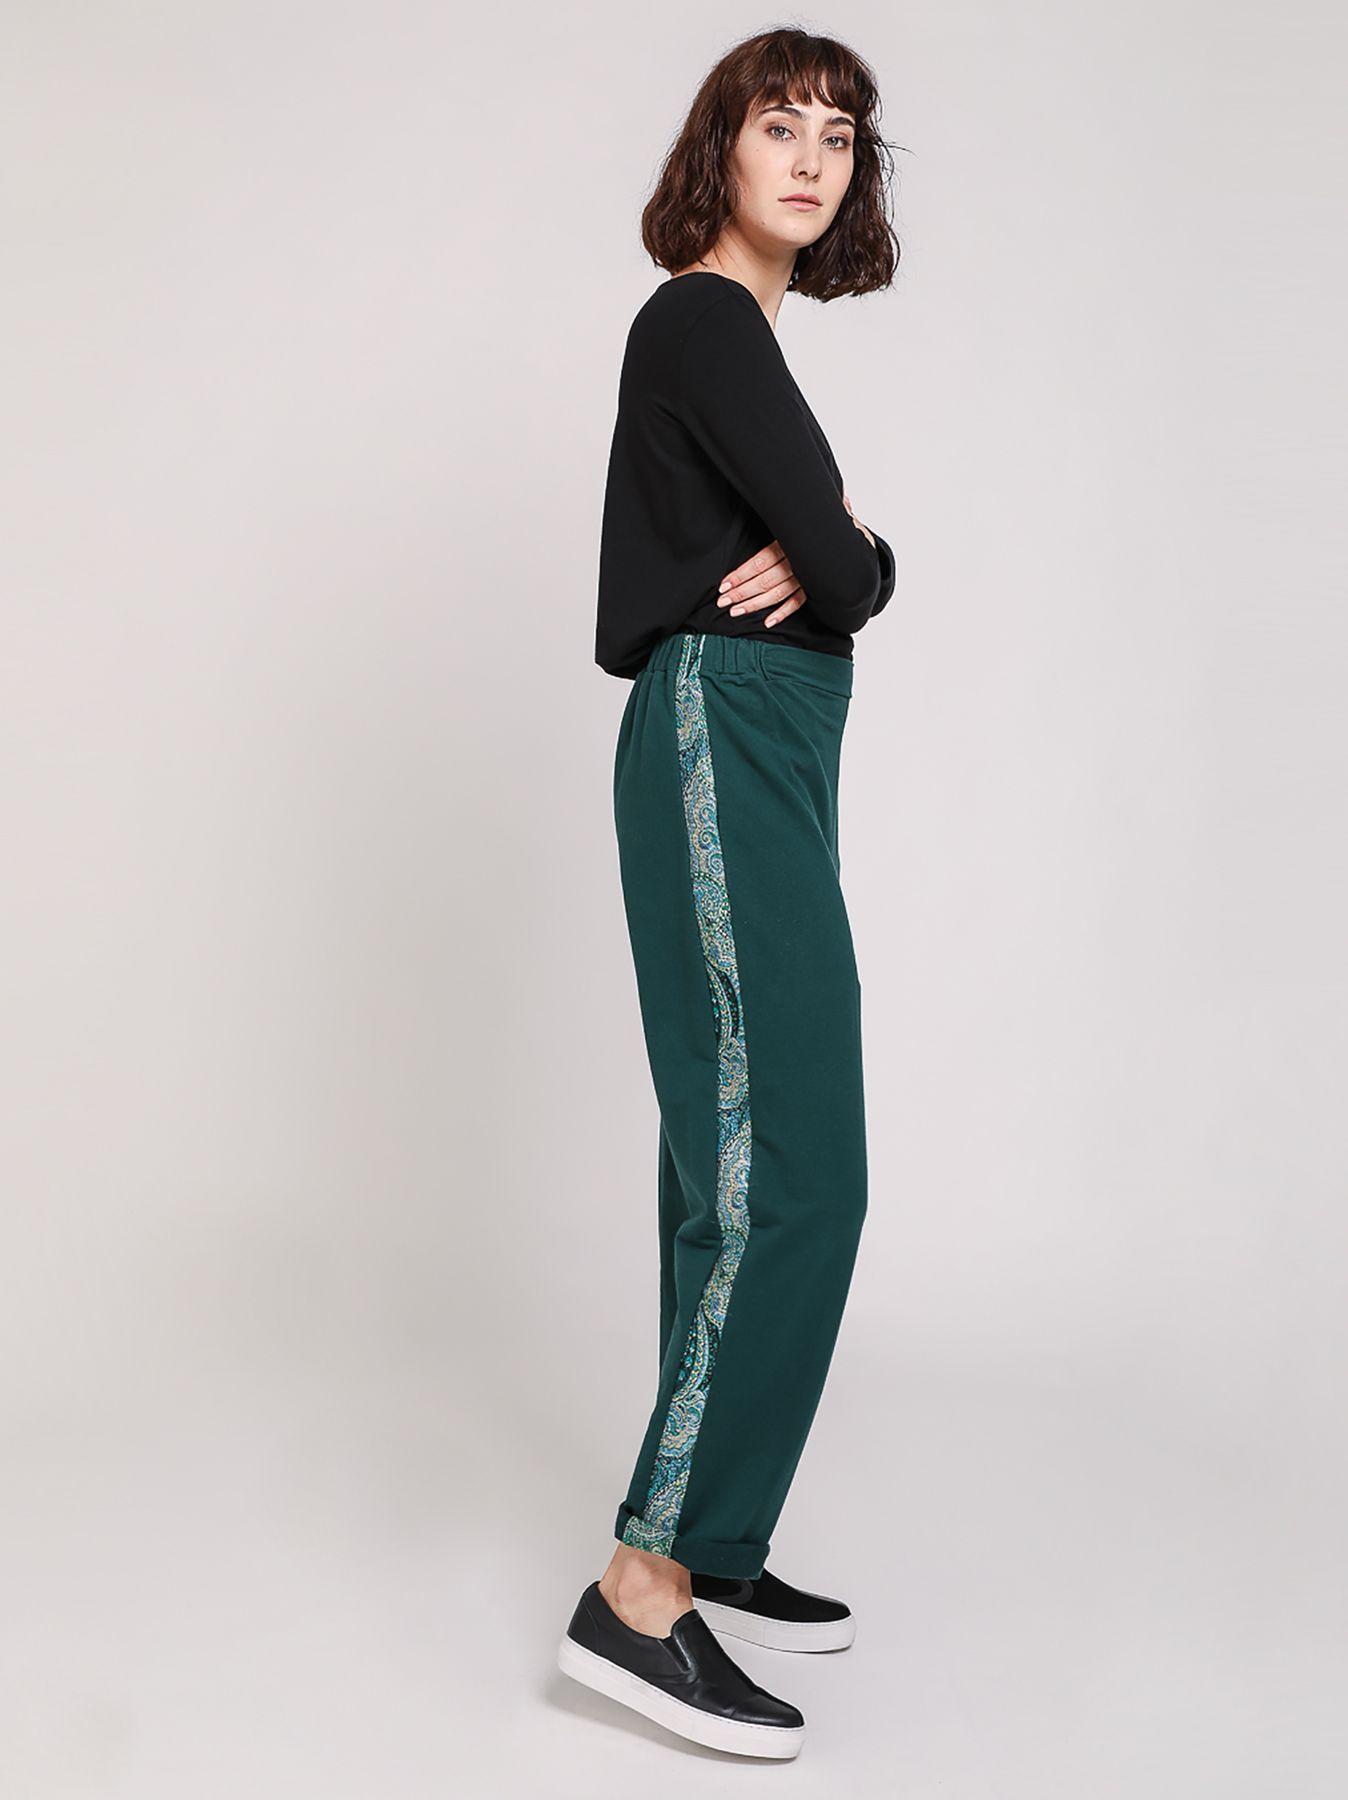 Pantalone in felpa con banda paisley